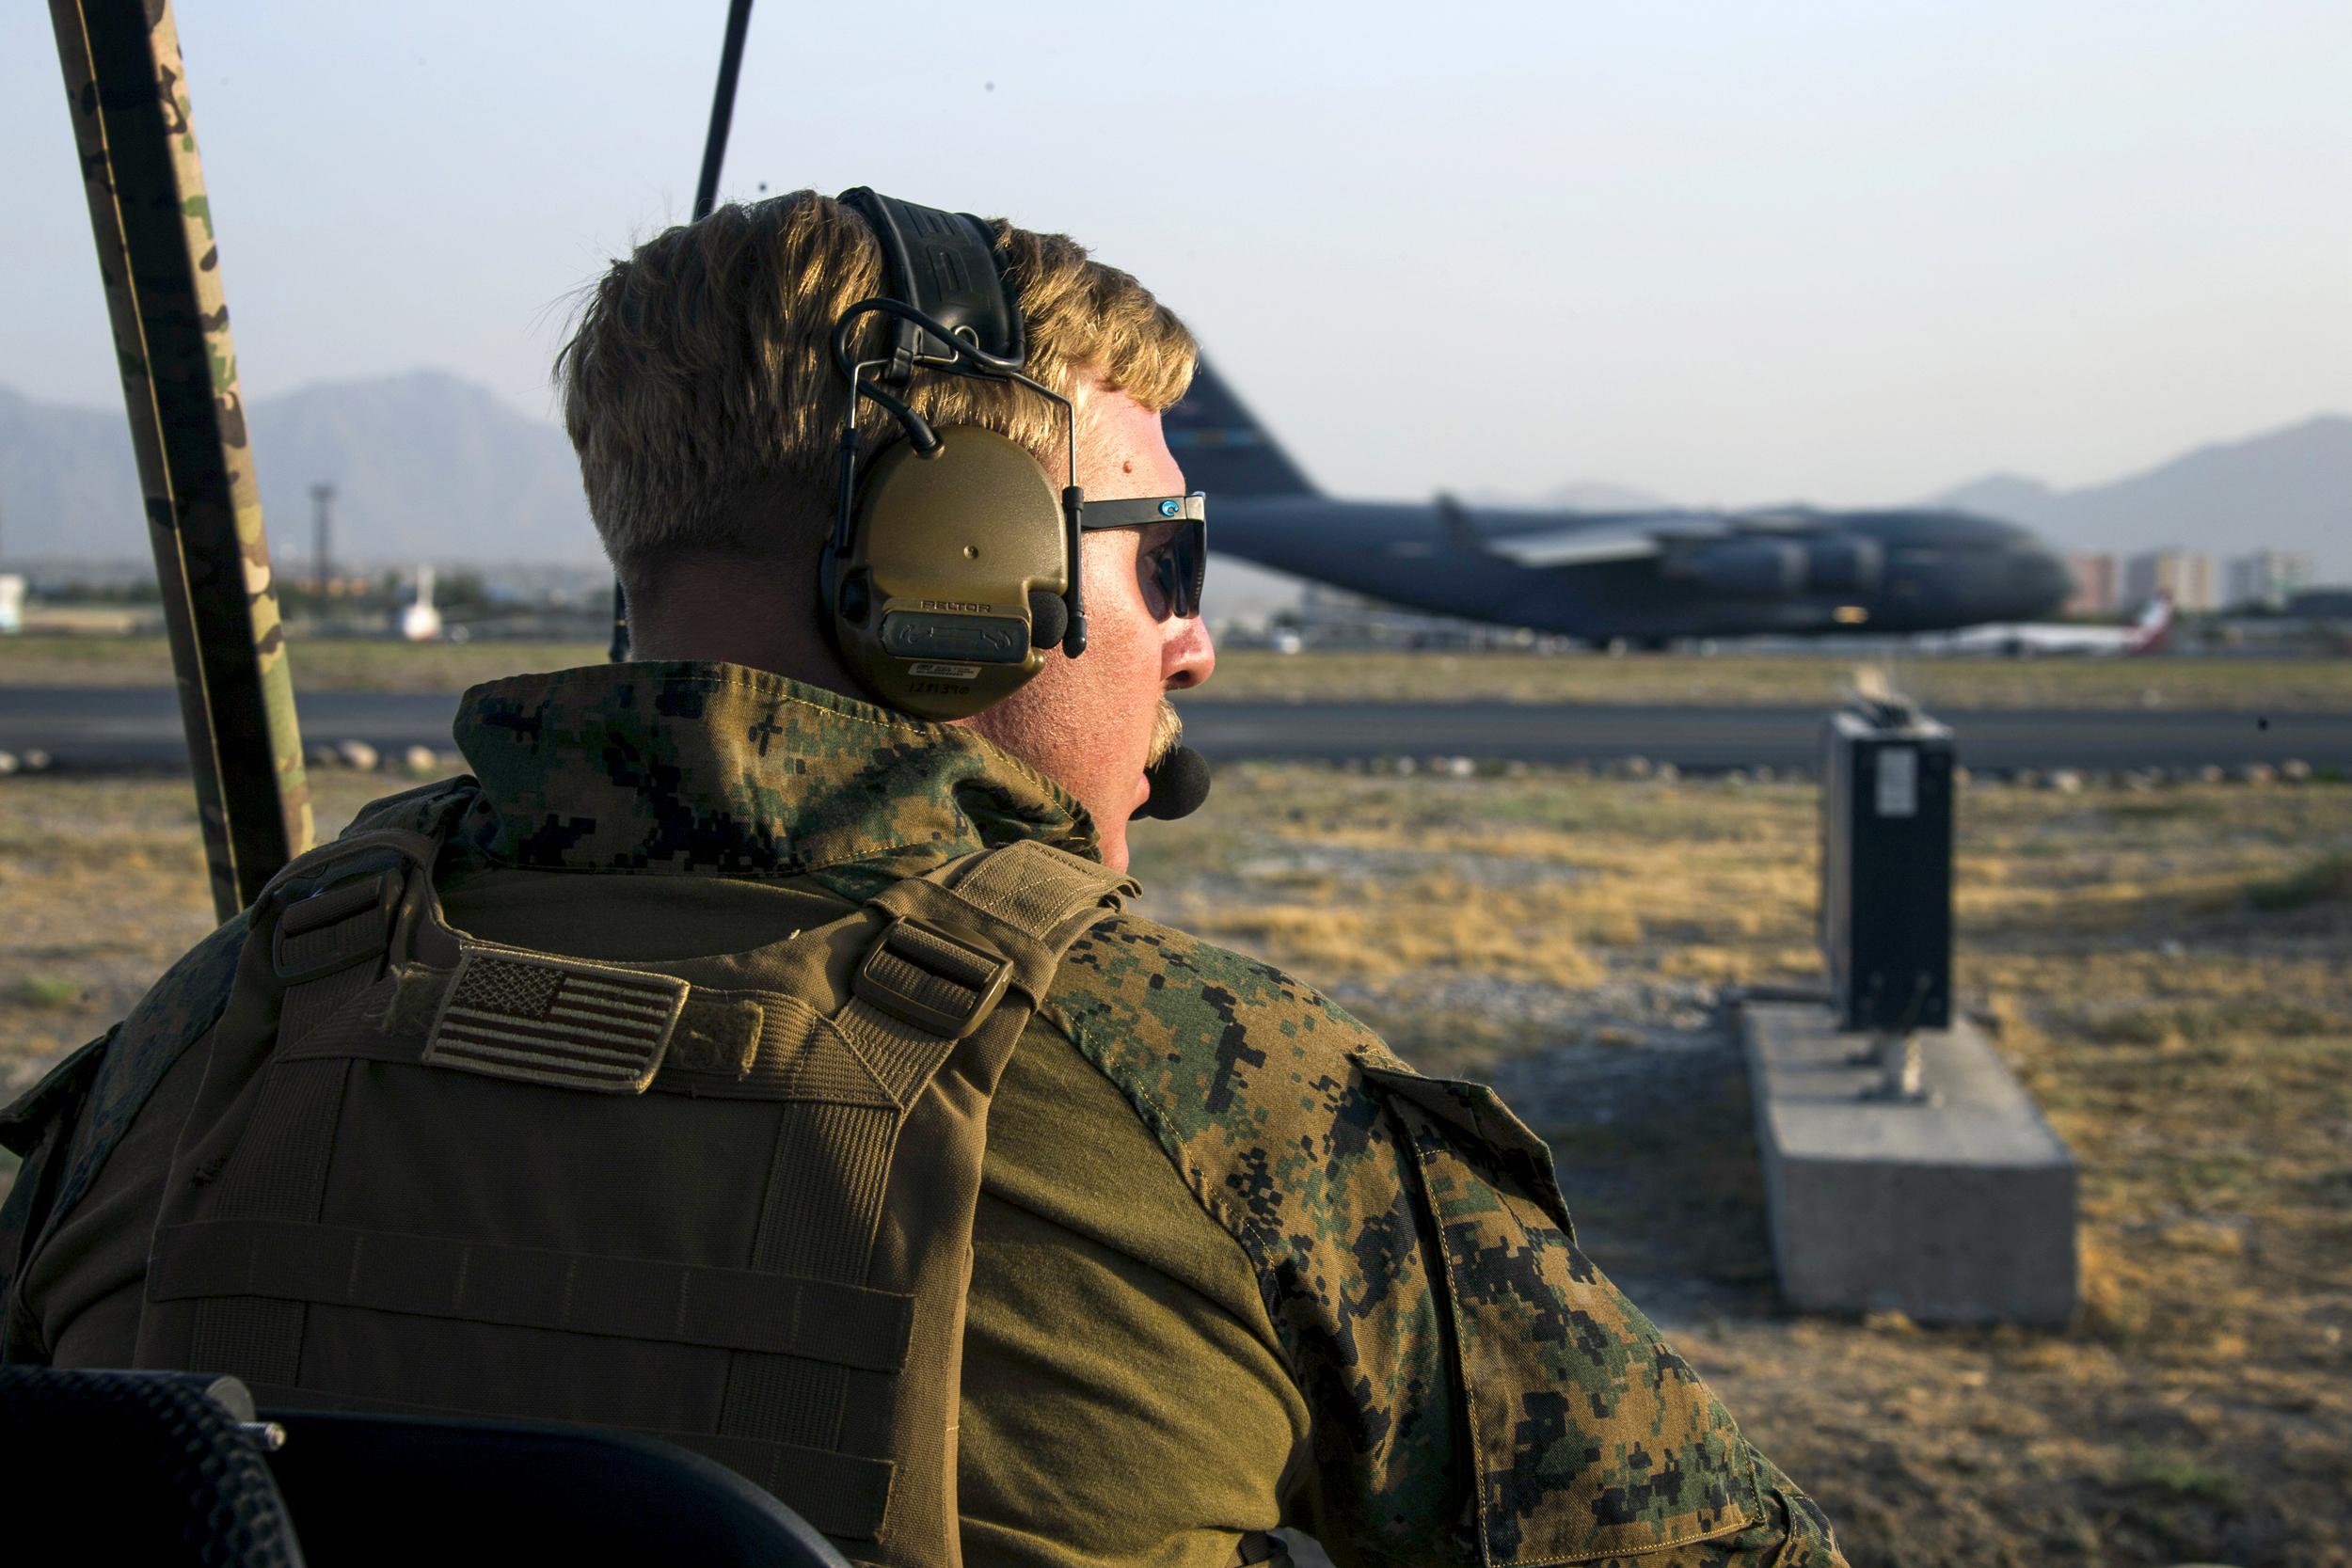 U.S. veterans revive long-dormant escape networks to save Afghan interpreters